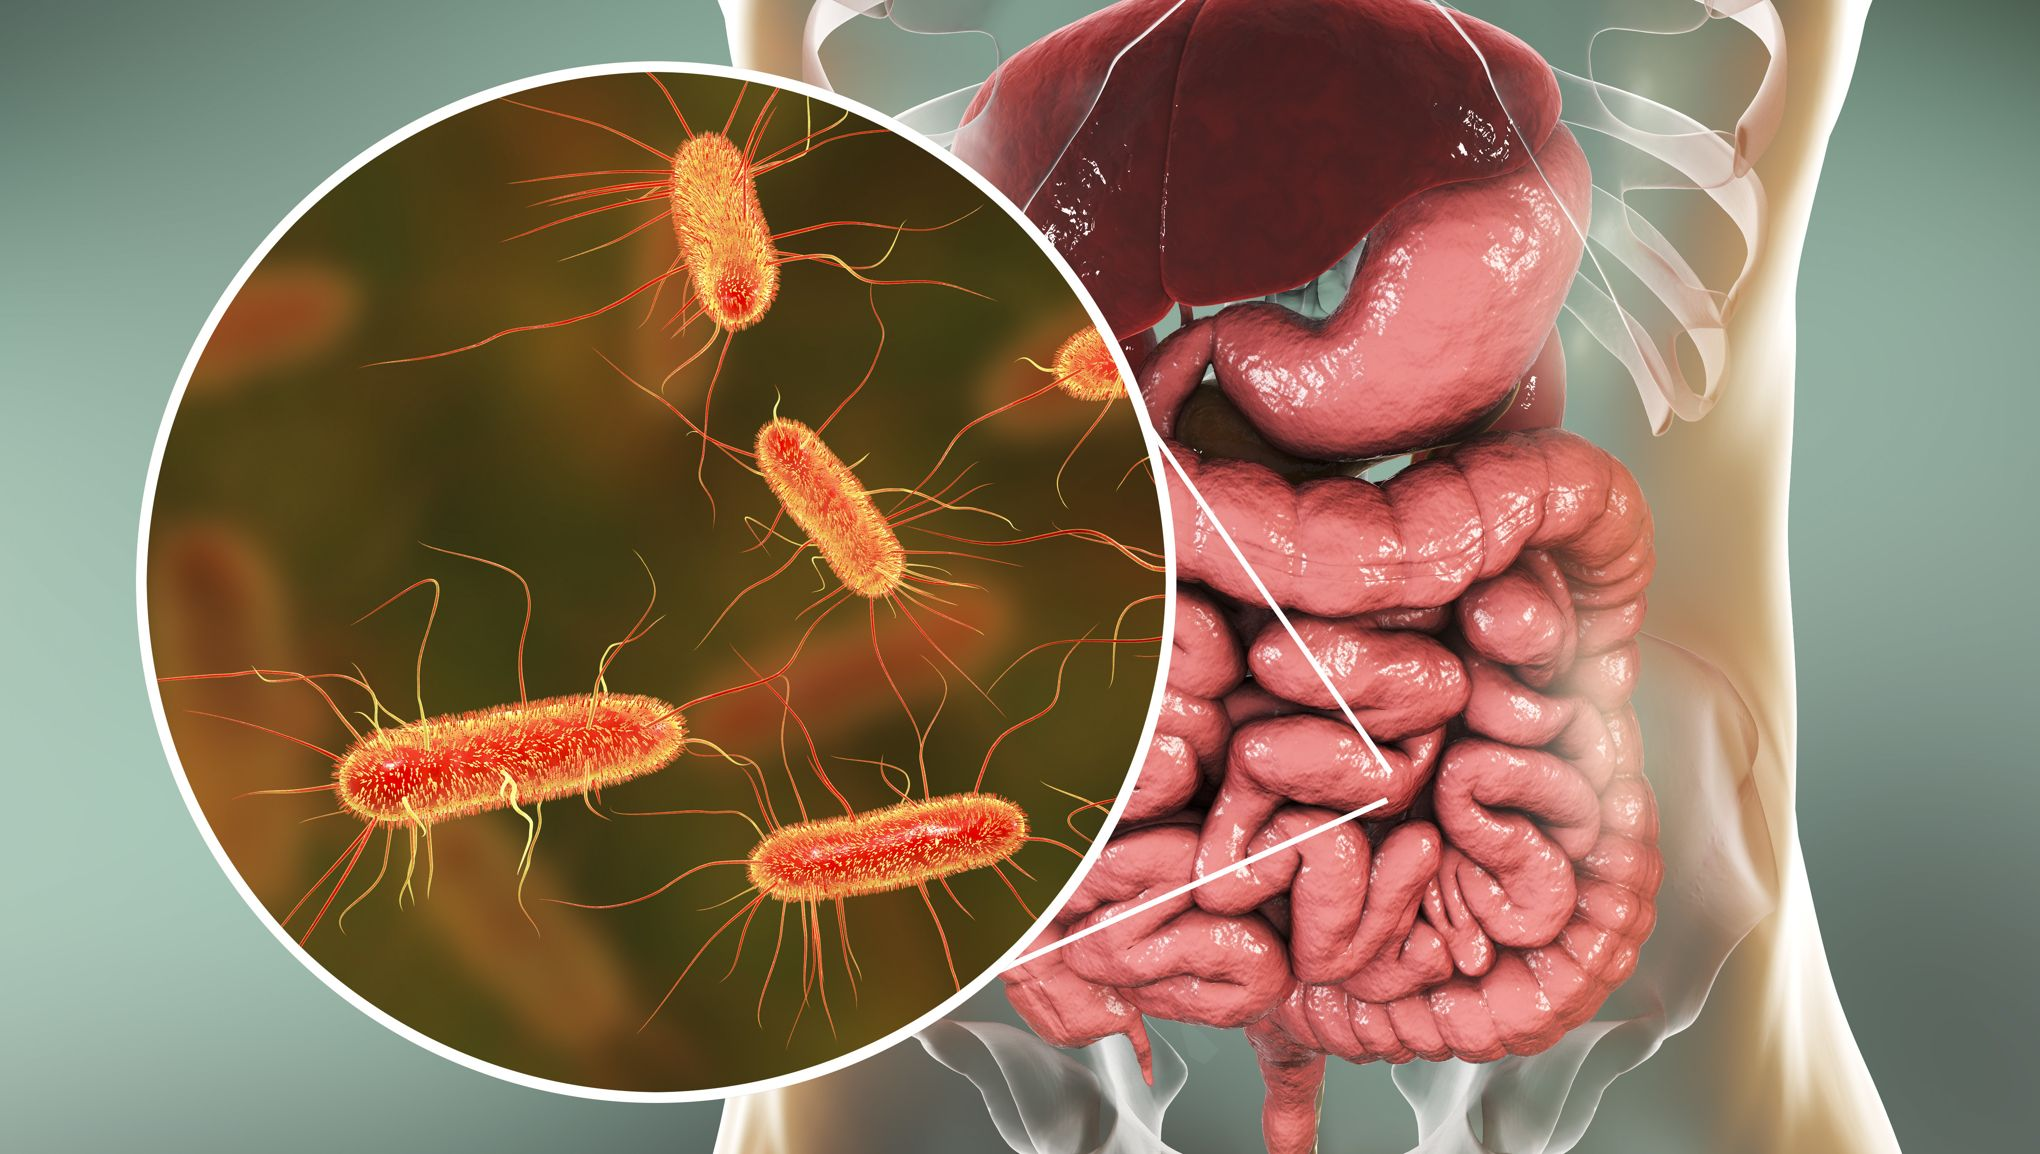 Tester son microbiote sert-il à quelque chose?